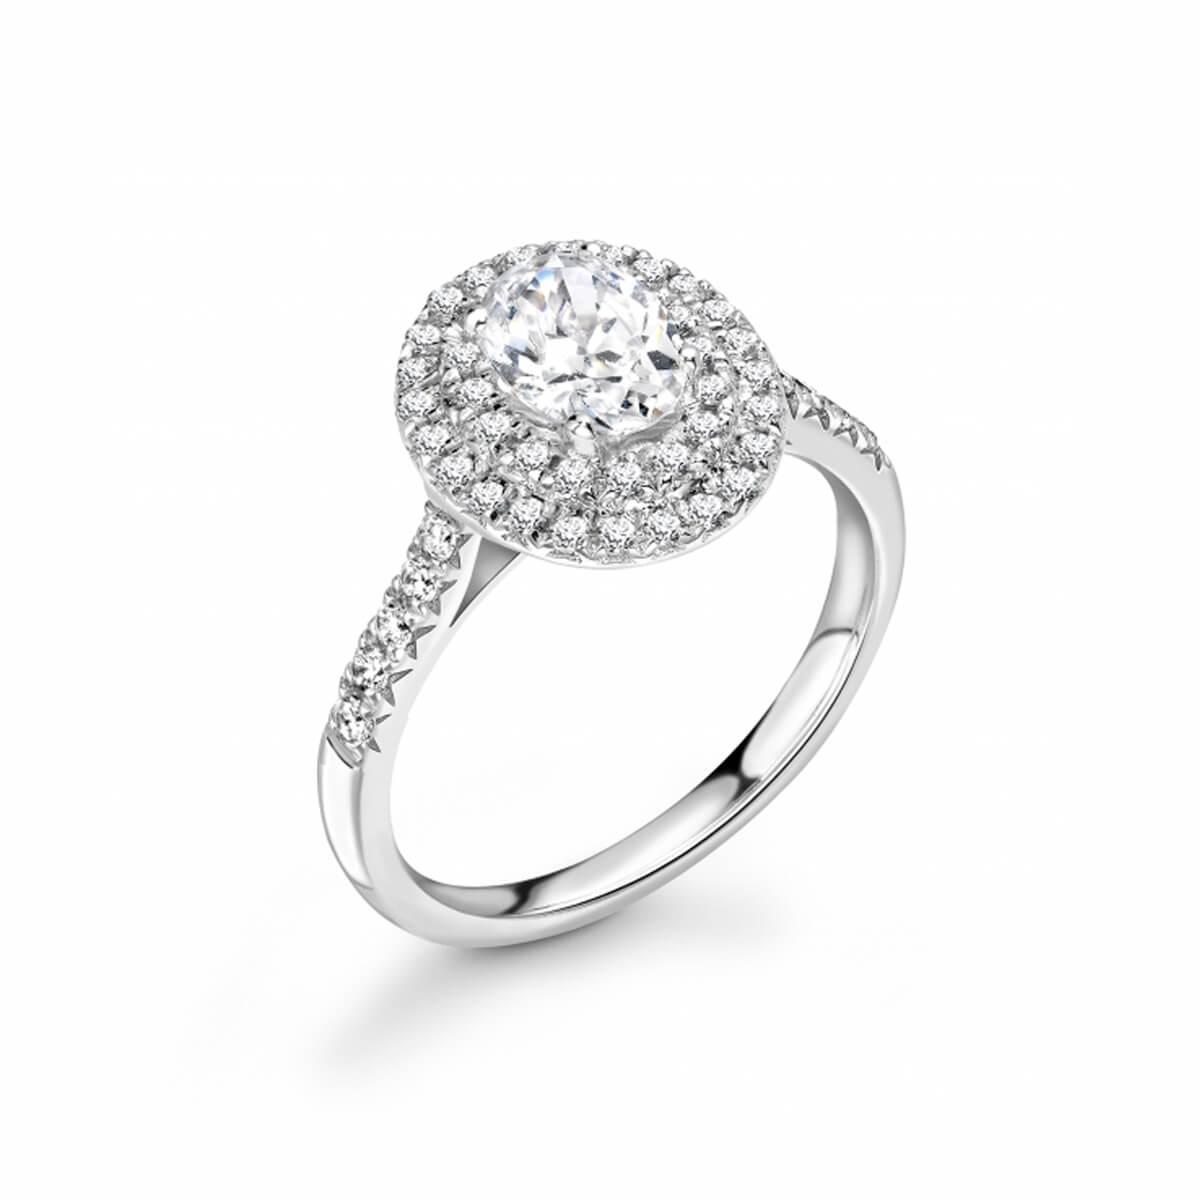 0.83ct Peony Halo | Oval Cut Diamond Double Halo Engagement Ring | Platinum